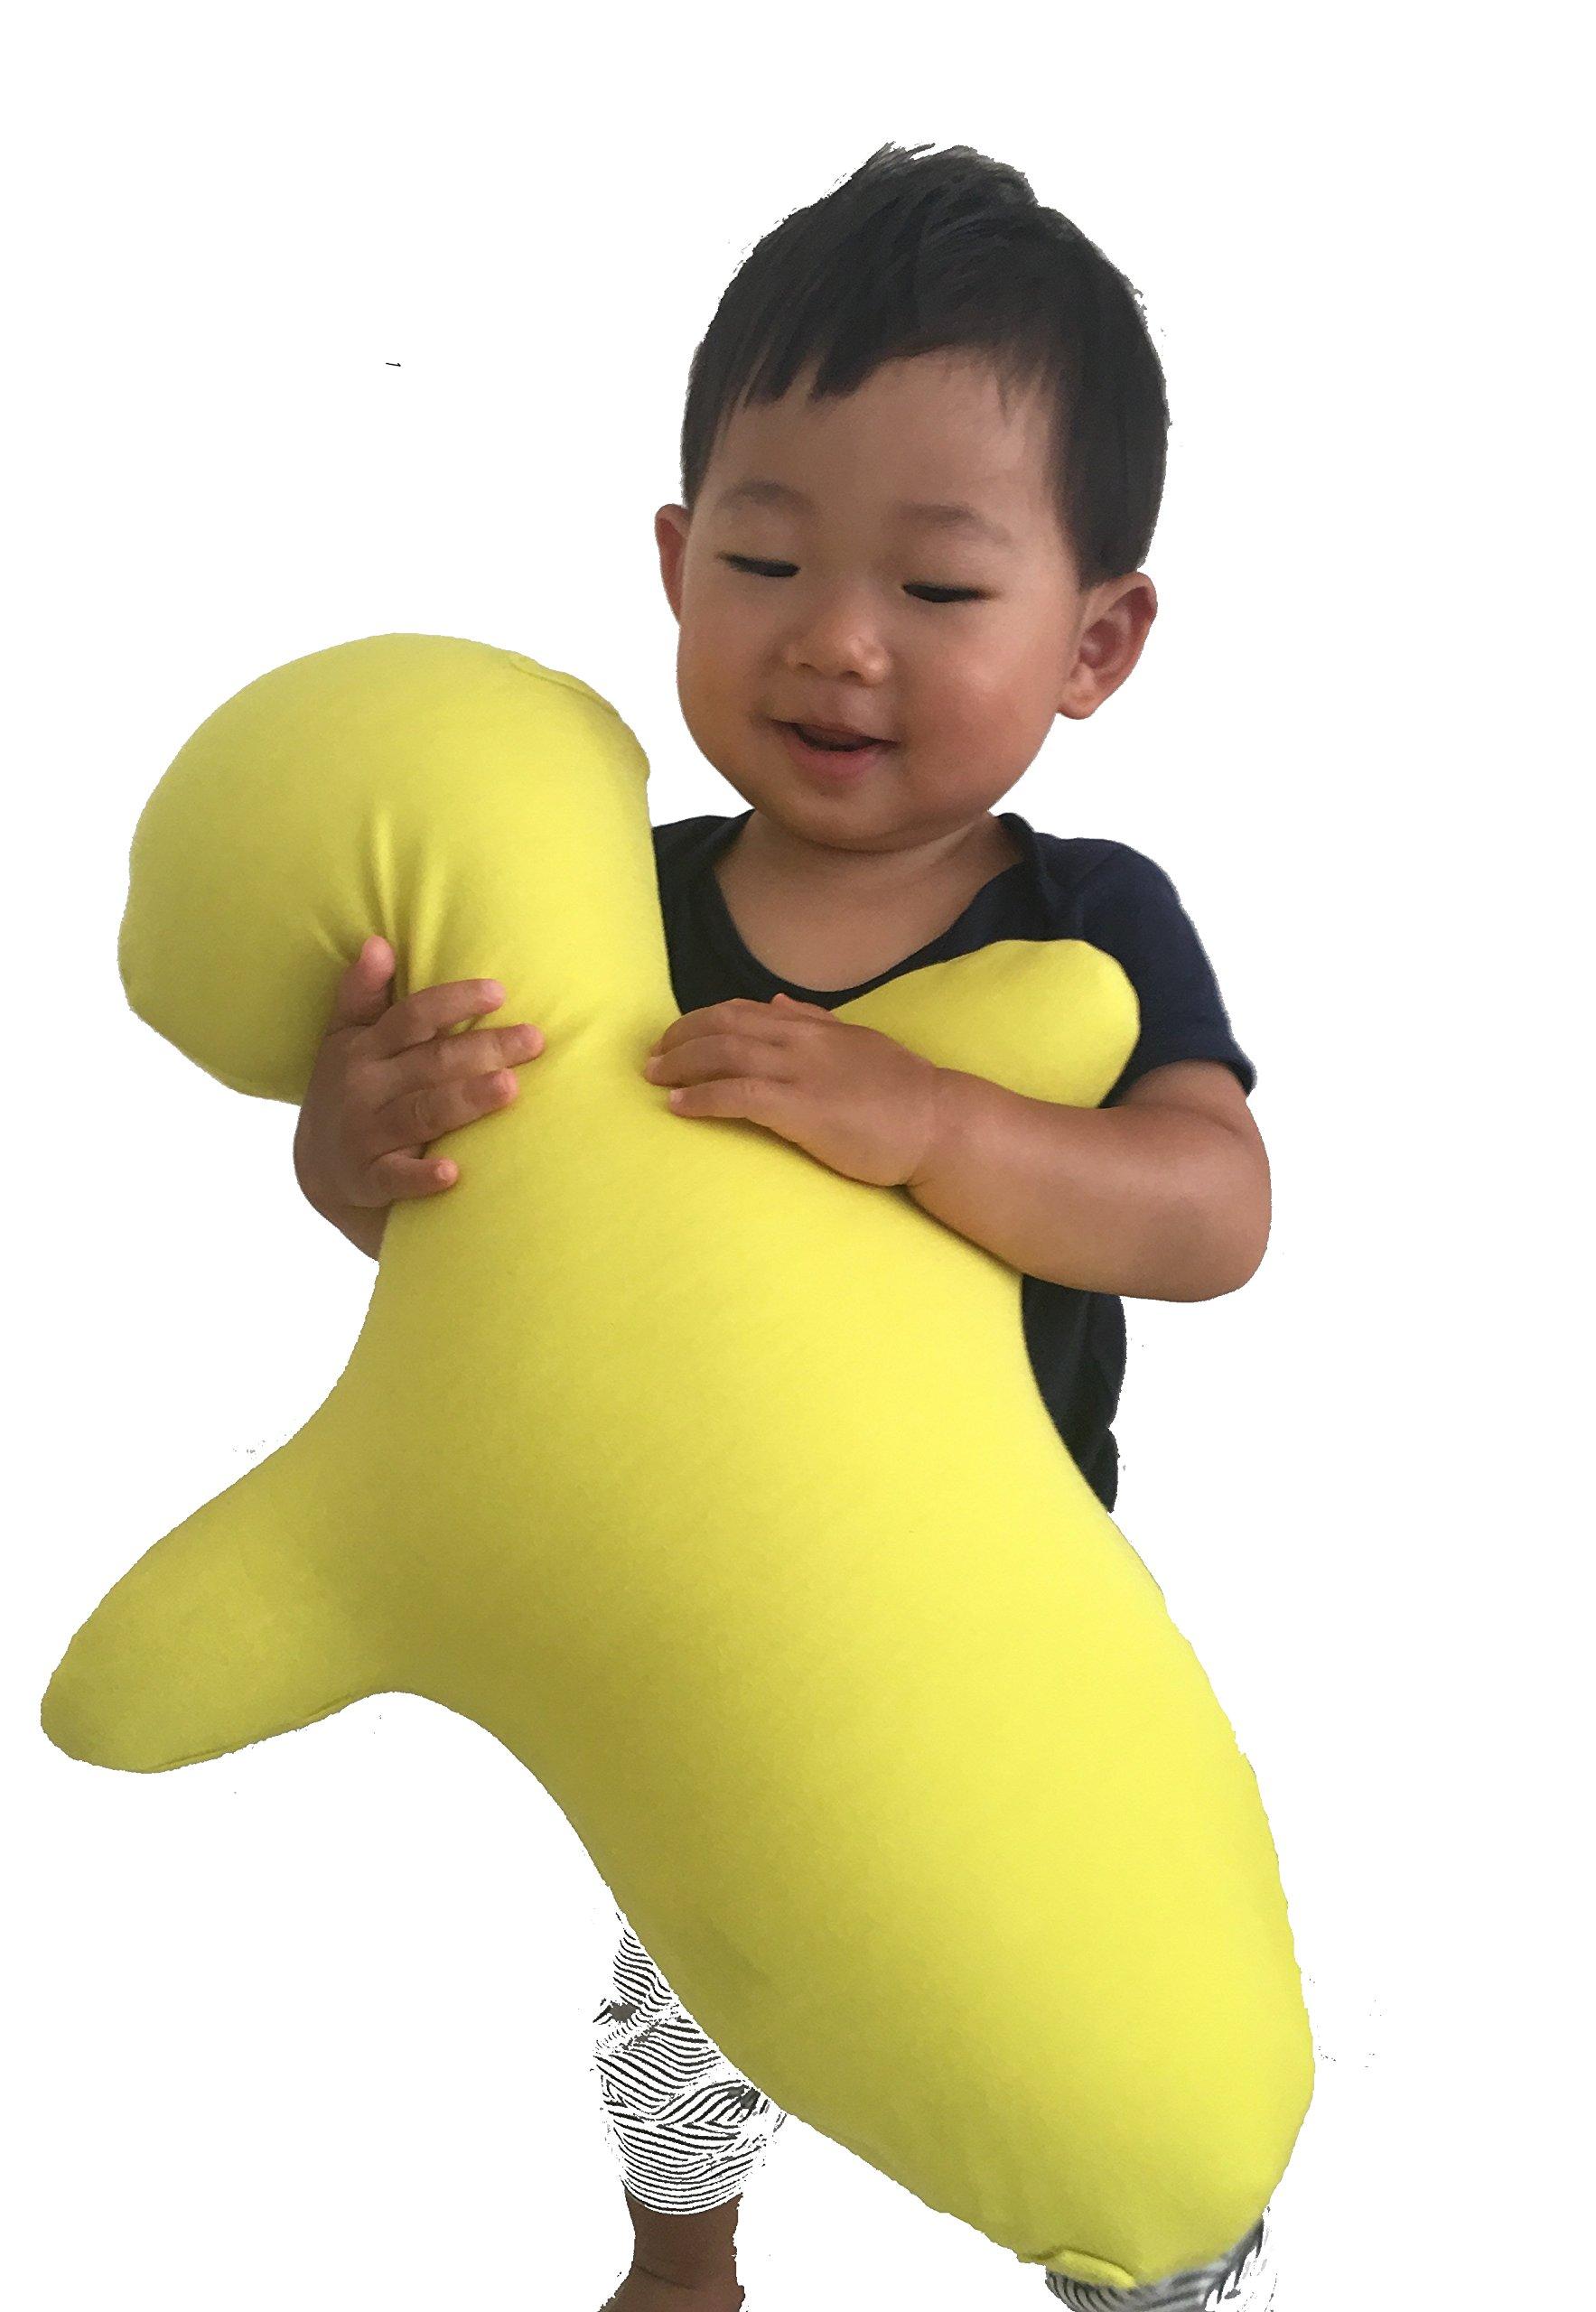 Kyoto Nishikawa Hugvie Huggable Communication & Relaxation Body Pillow (Yellow, Kids)